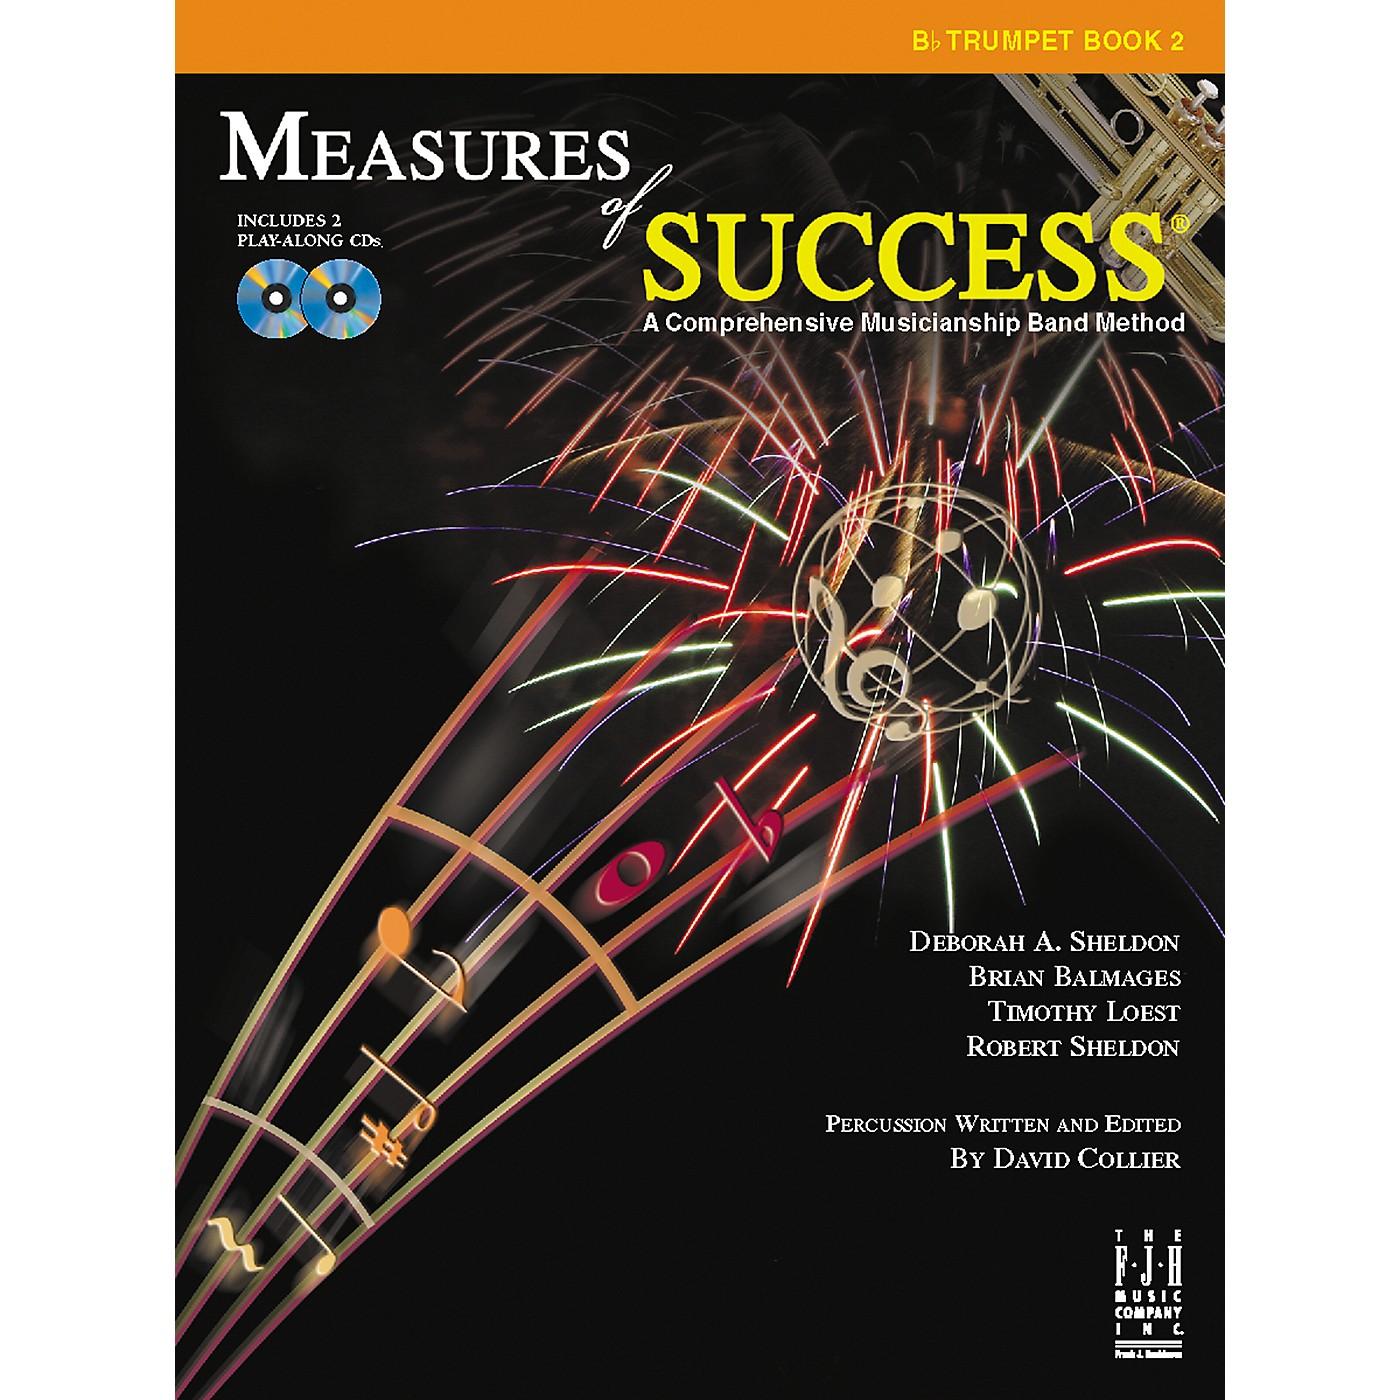 FJH Music Measures of Success Trumpet Book 2 thumbnail